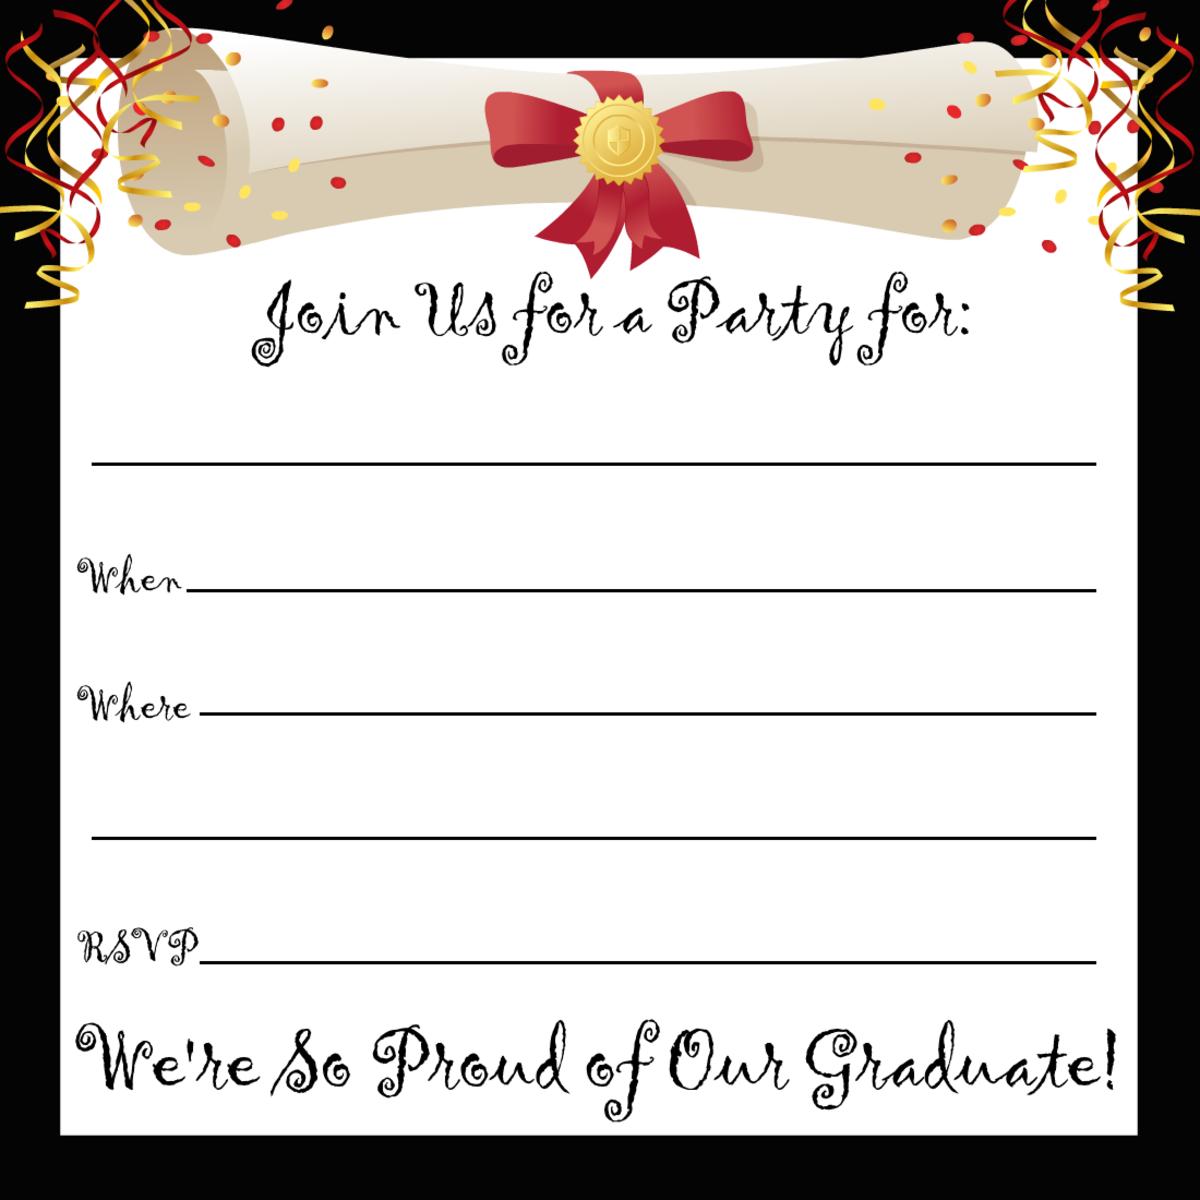 Free printable graduation party invitation with black border and diploma